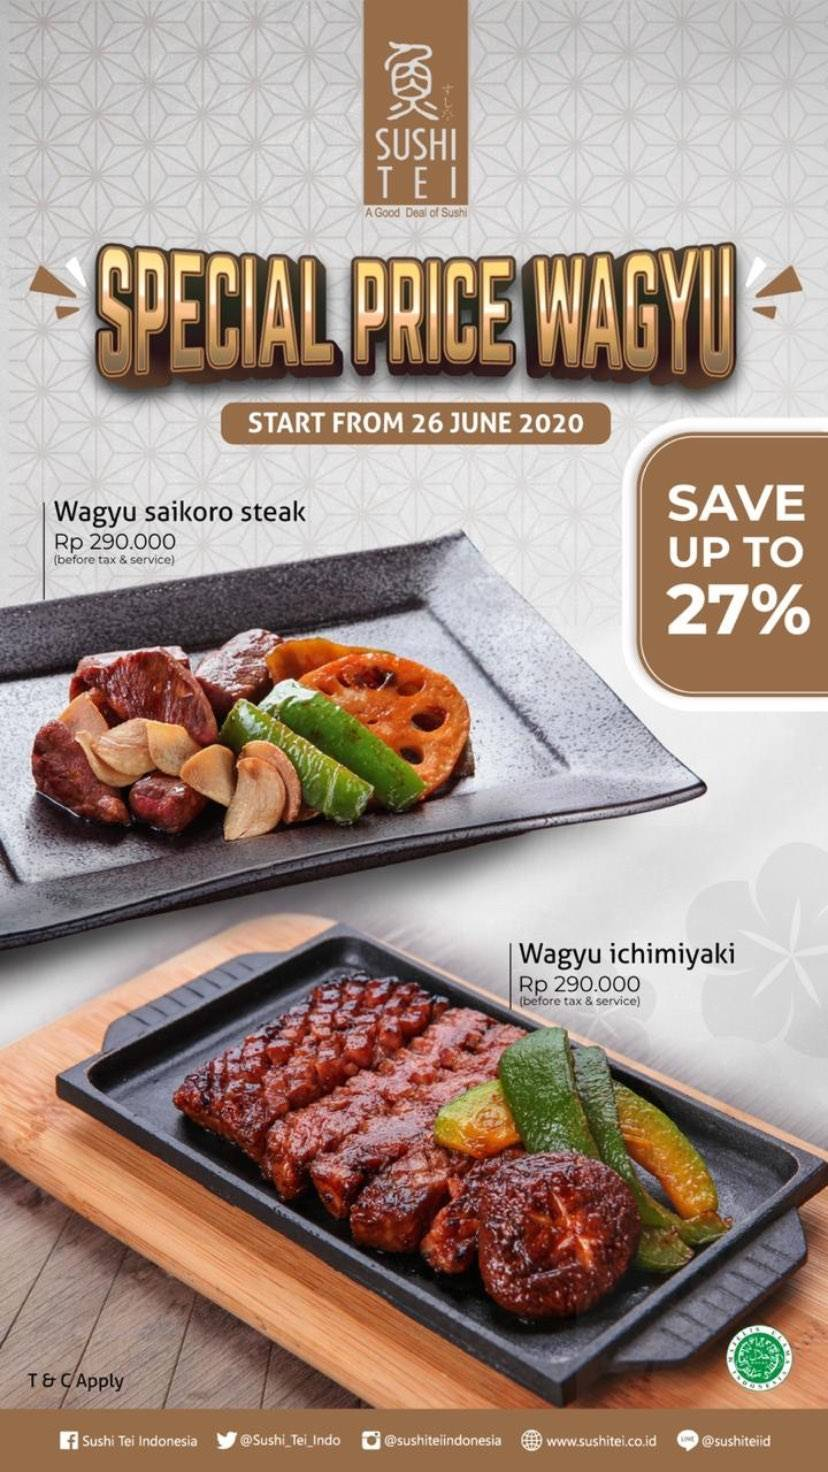 Diskon Sushi Tei Promo Special Price Wagyu Save up to 27%